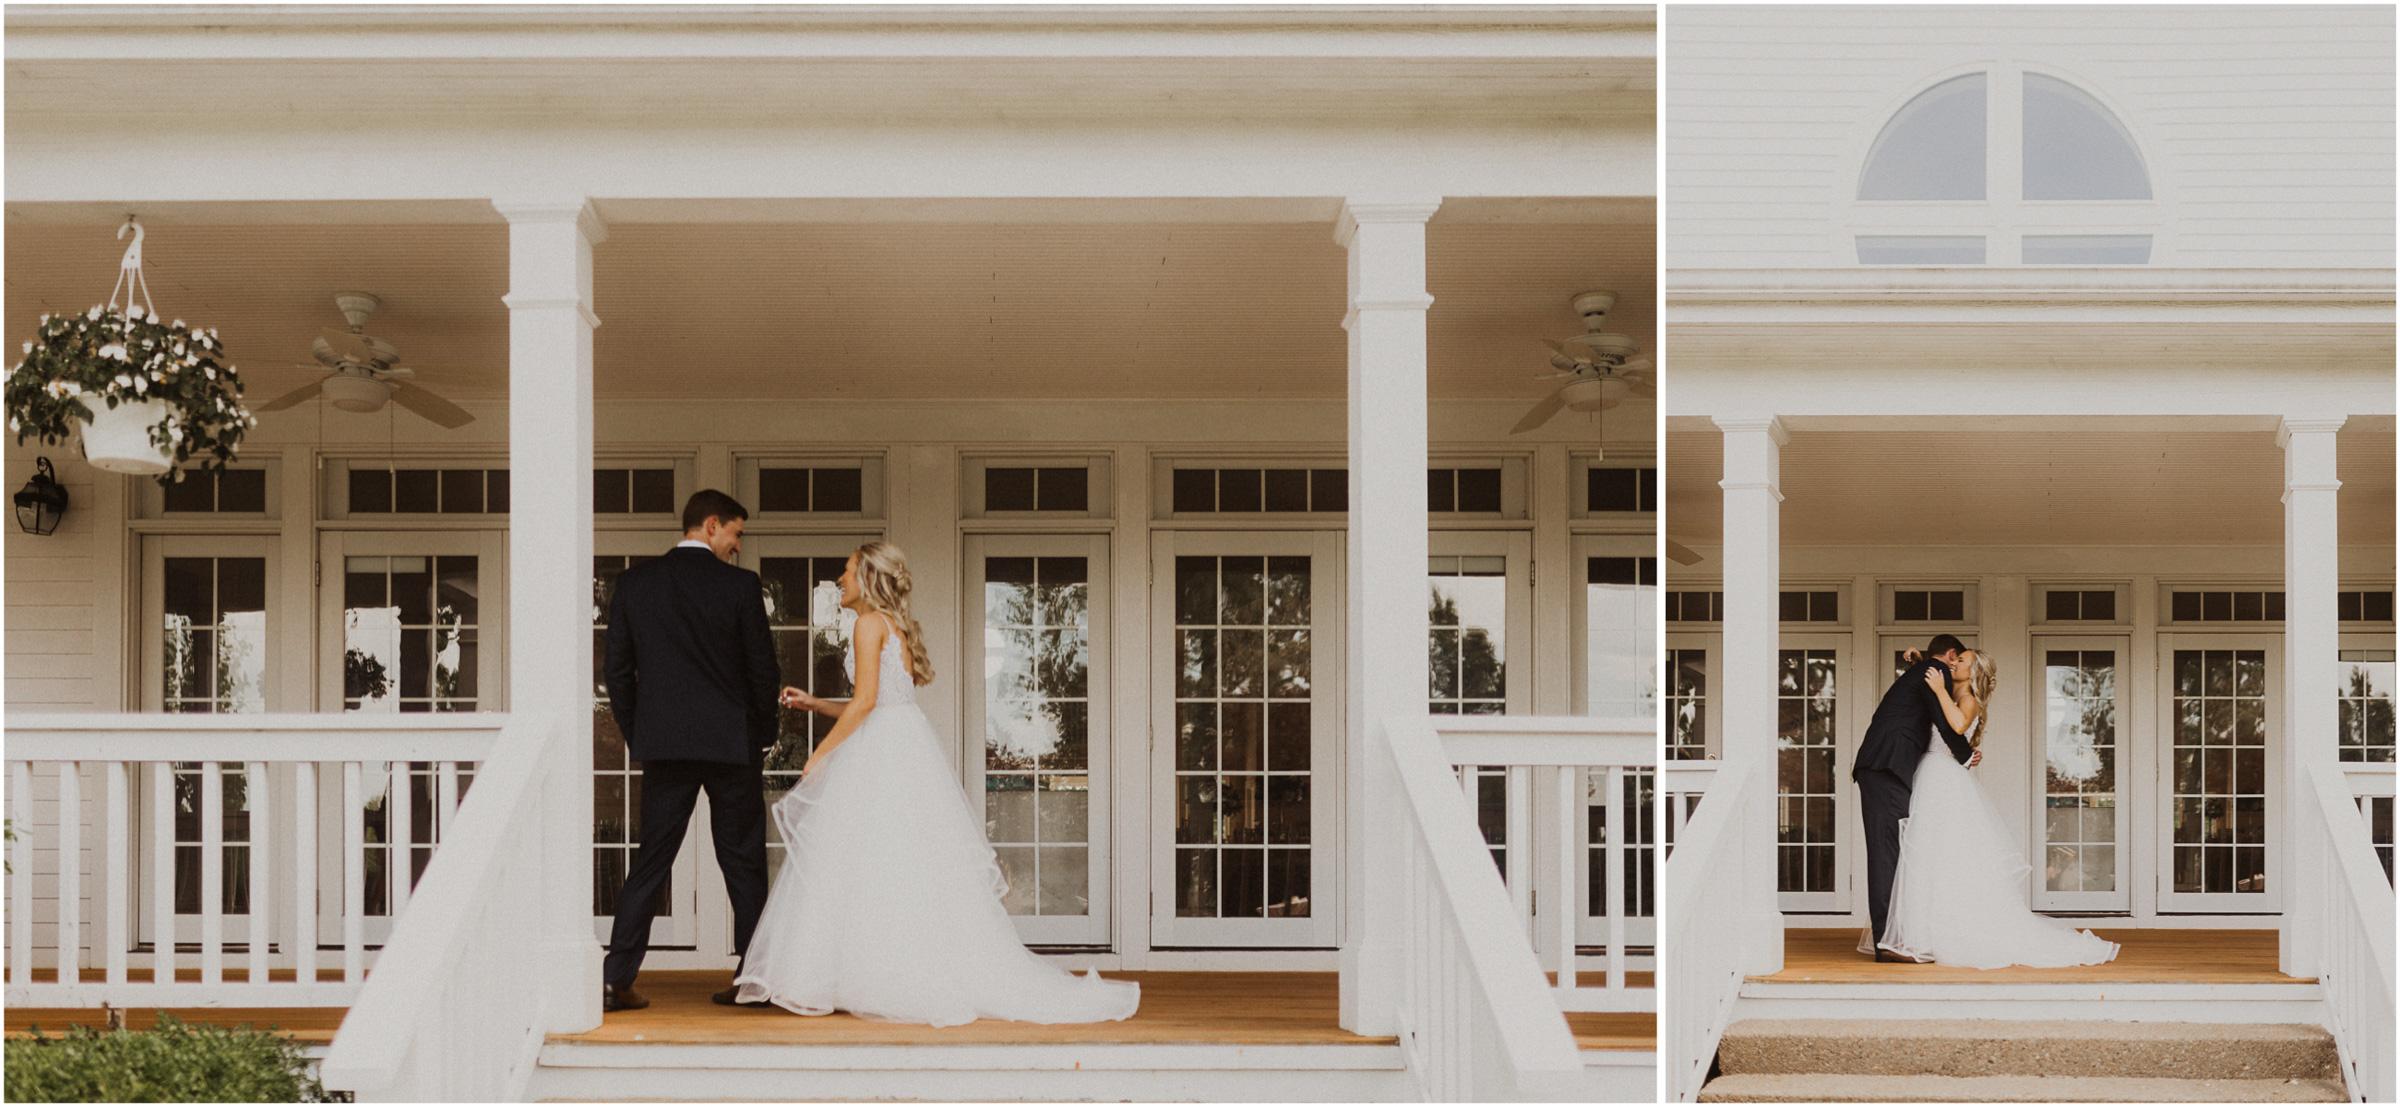 alyssa barletter photography hawthorne house summer outdoor wedding southern charm inspiration-19.jpg